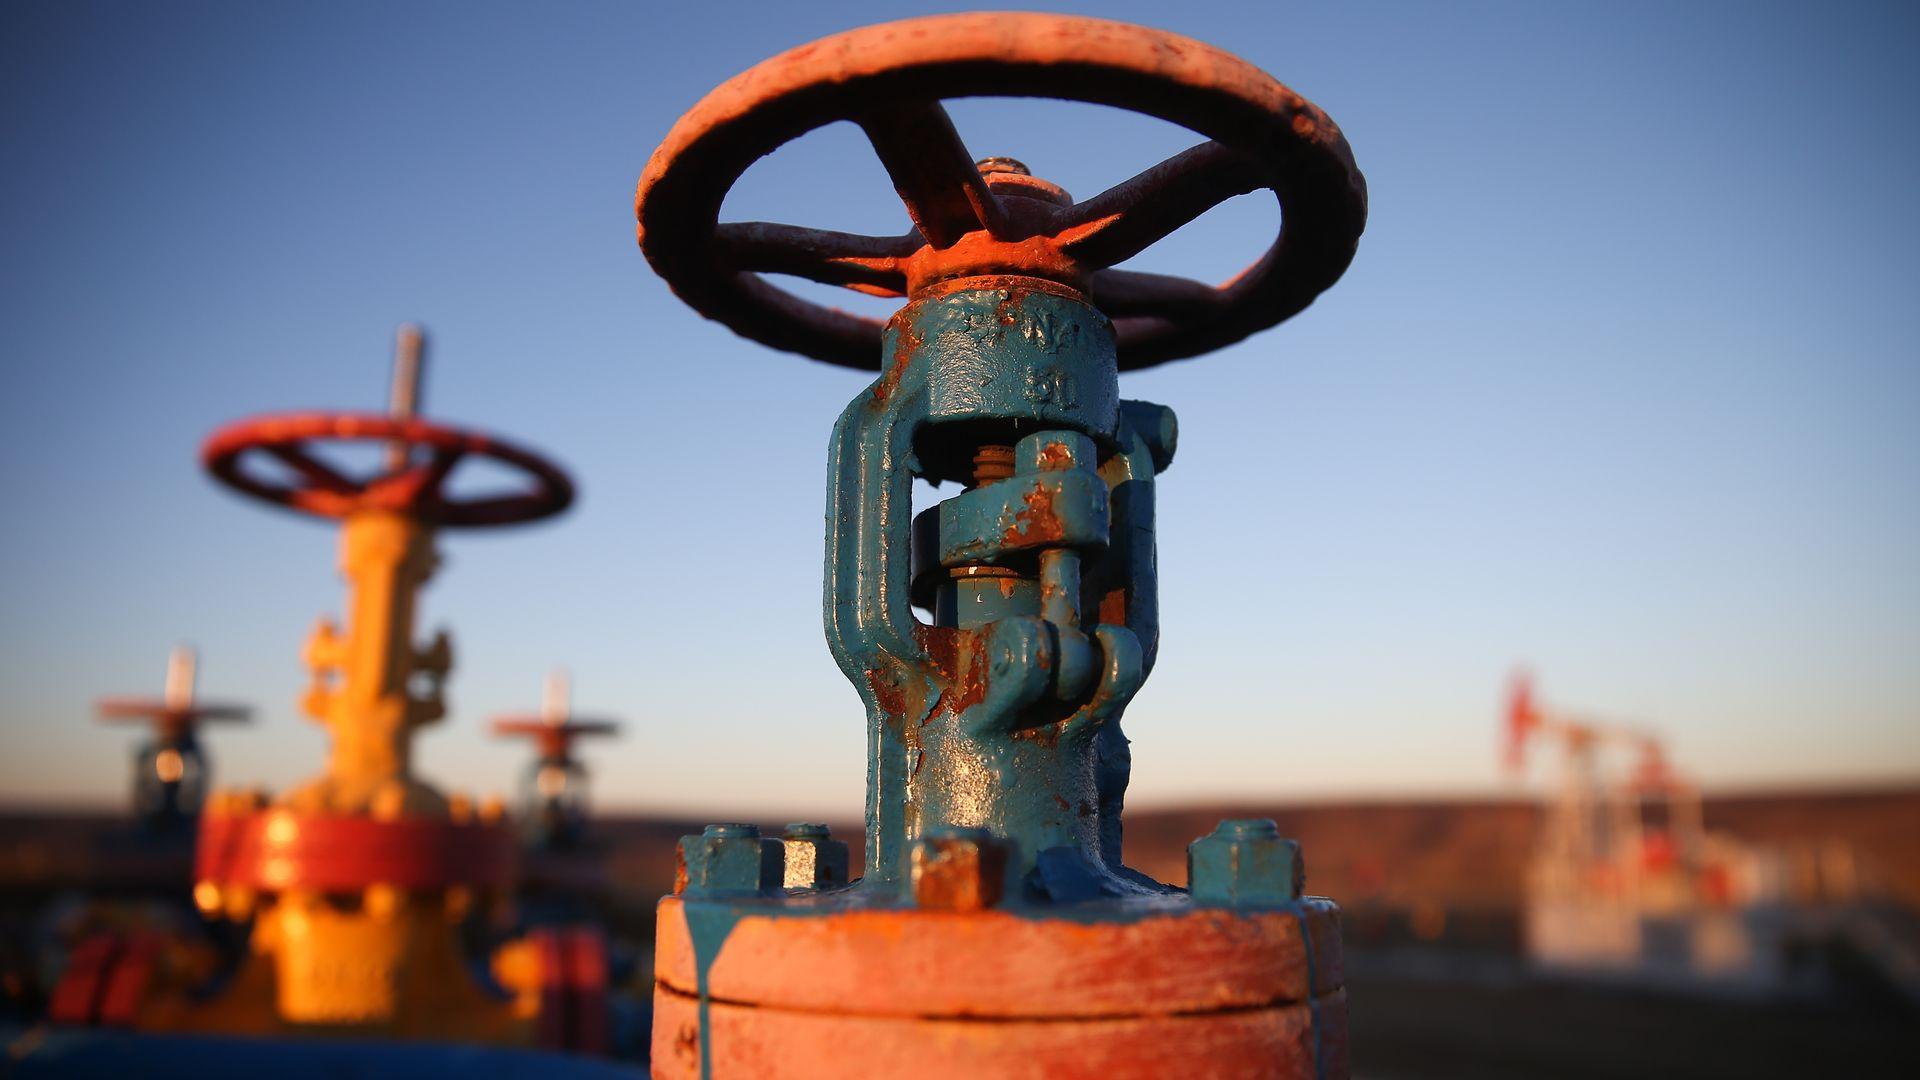 Big orange and blue valve